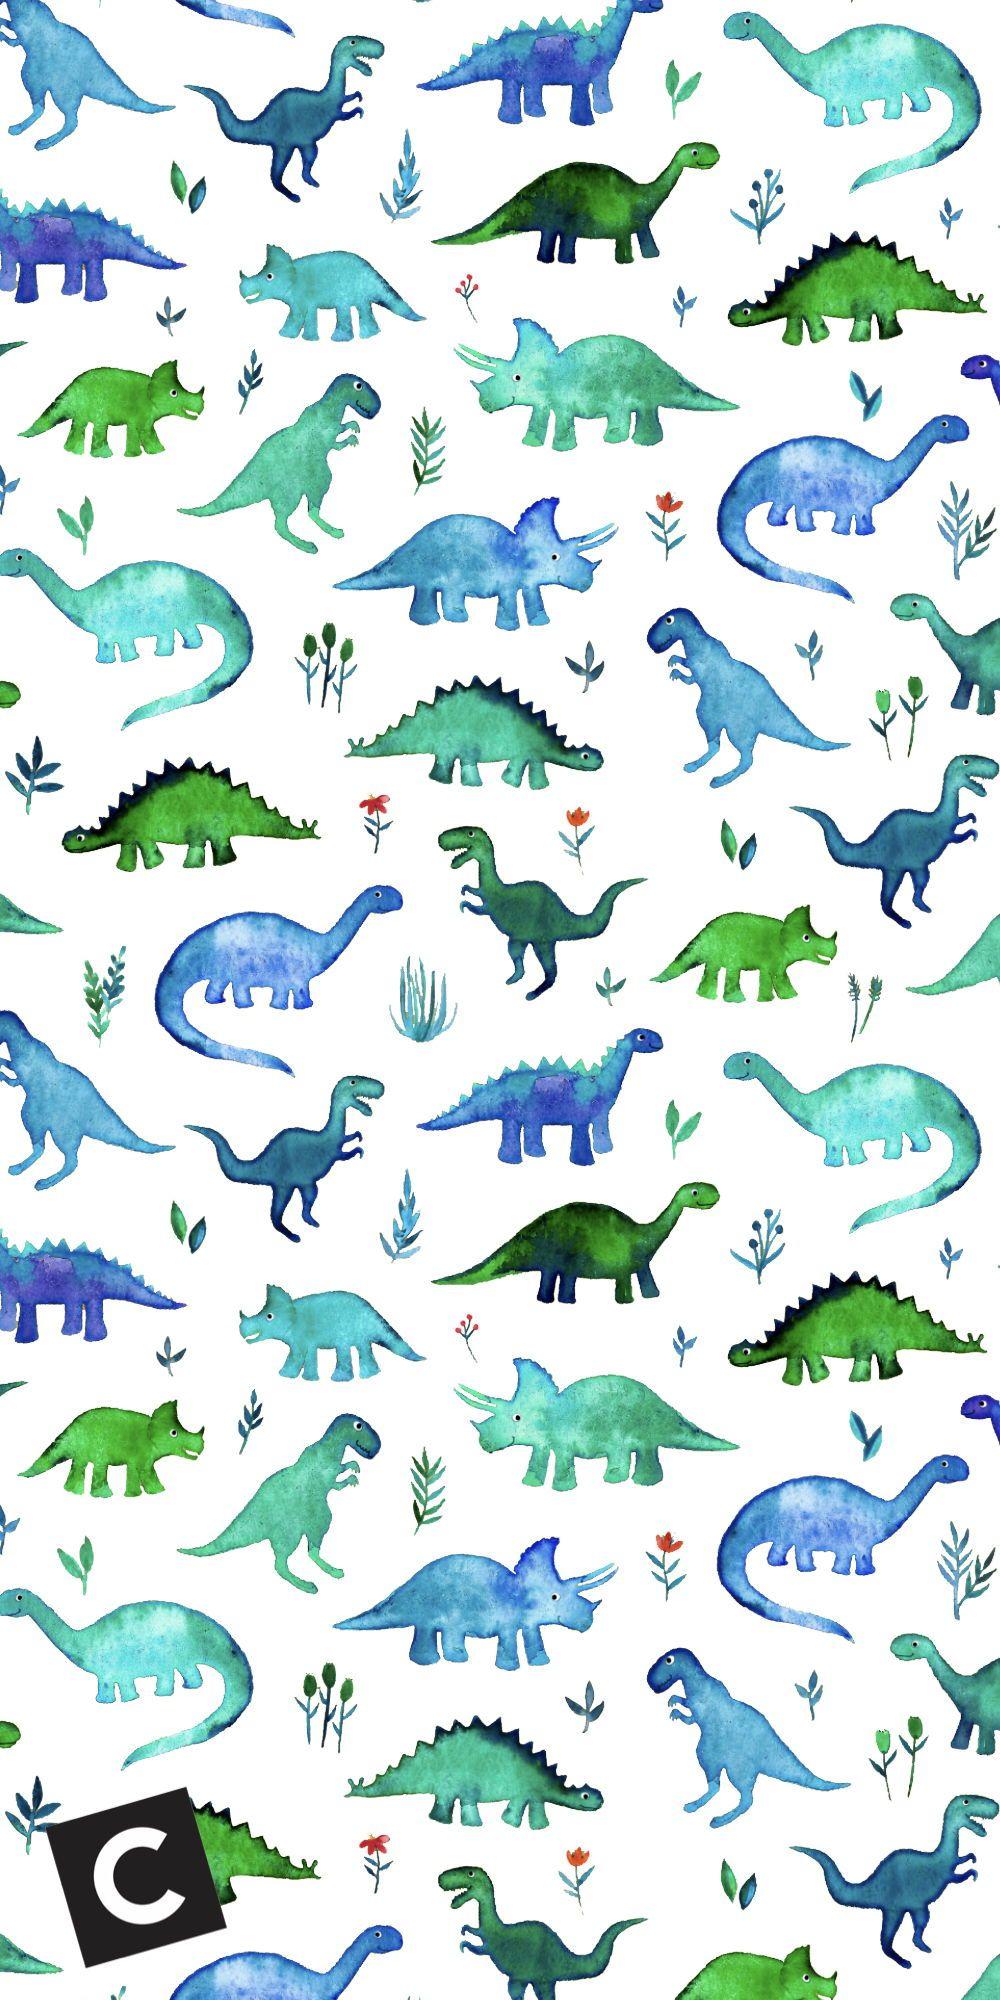 Icon Map Symbol Icons Background Fondos De Pantalla Dinosaurios Fondos De Dinosaurios Fondos De Pantalla Divertidos Para Iphone